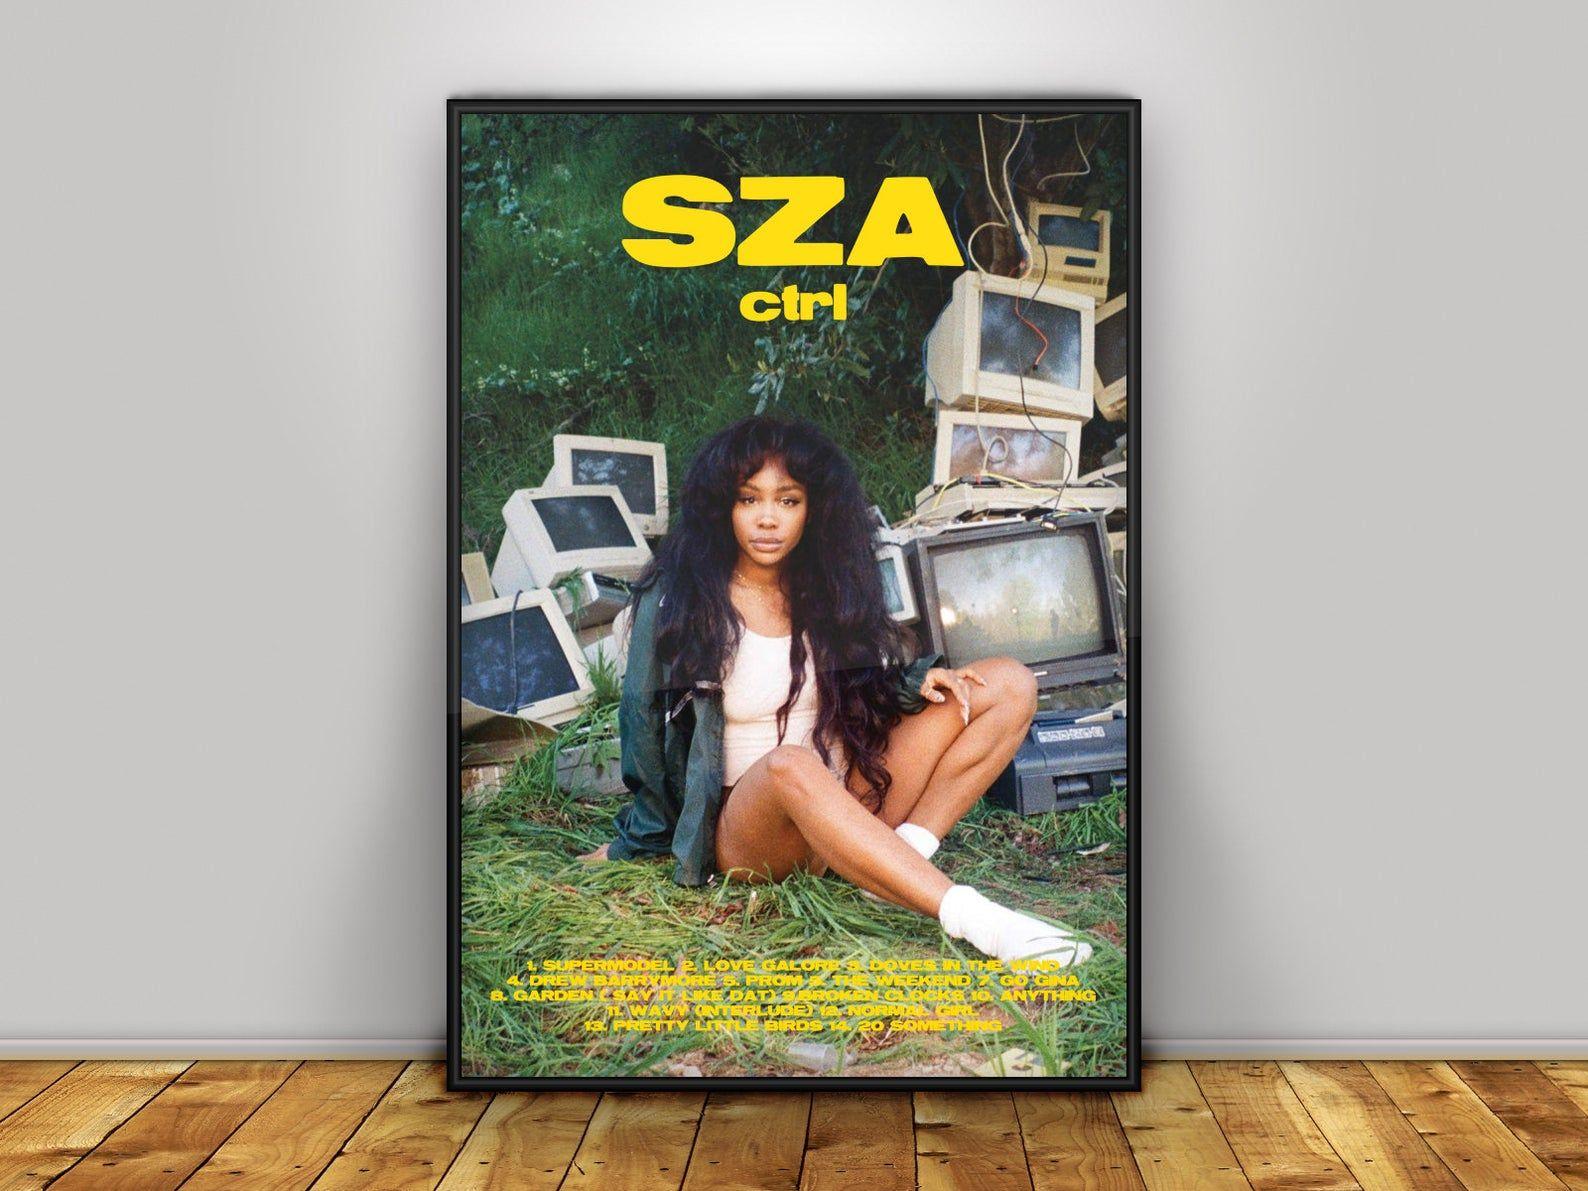 SZA CTRL Poster SZA Poster Ctrl Album Cover Poster Digital Download